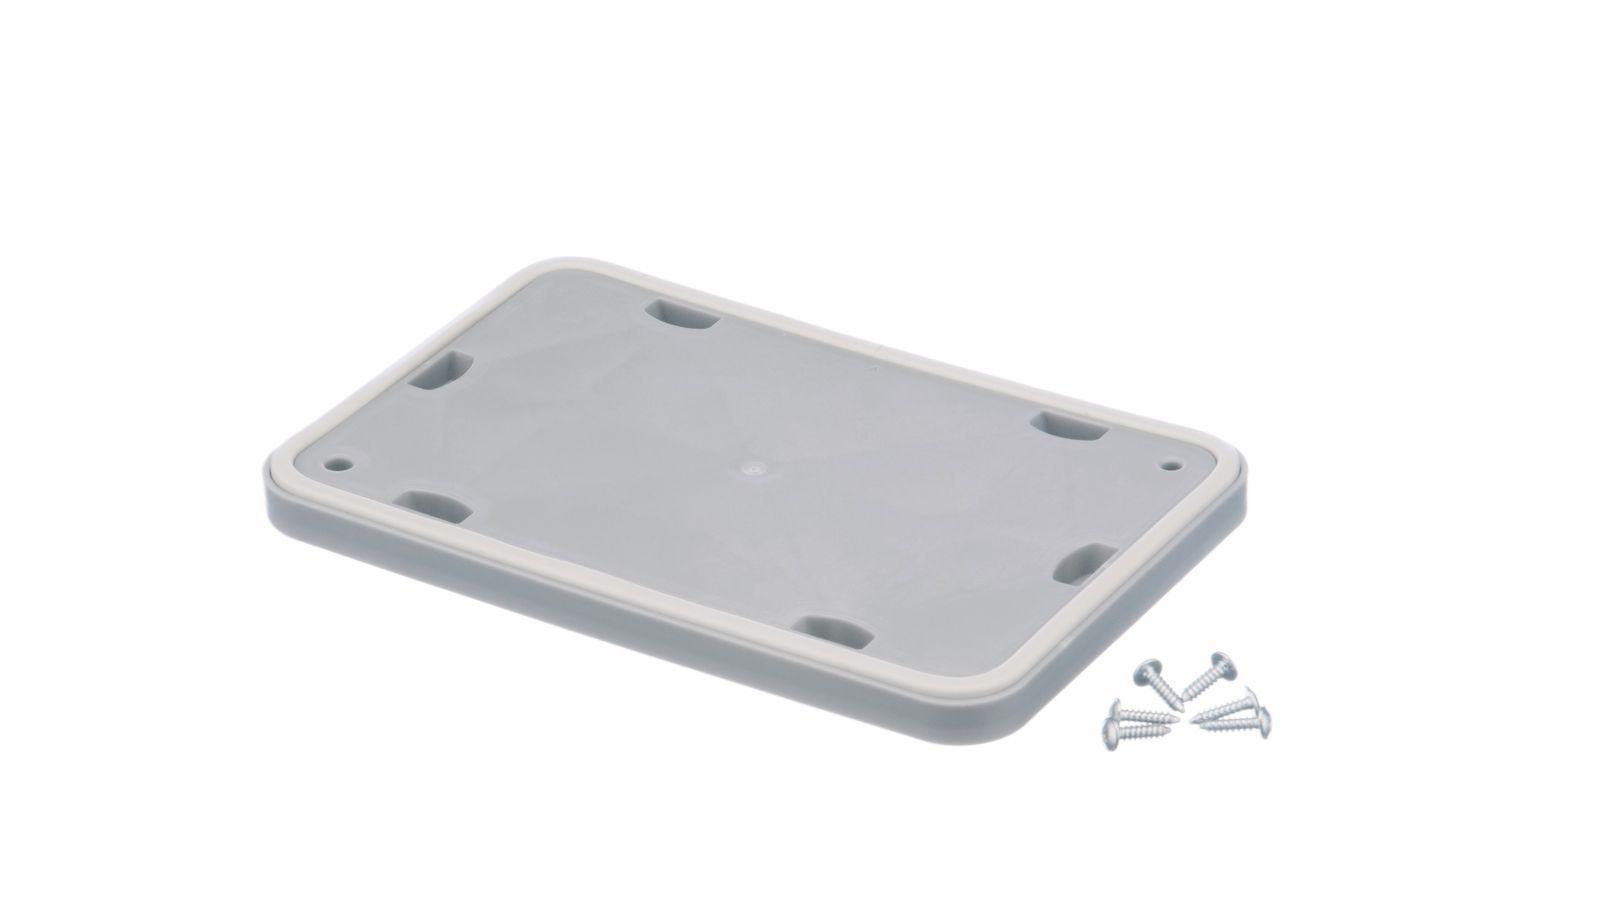 Sealing Kit for Bosch Siemens Tumble Dryers - service kit BSH